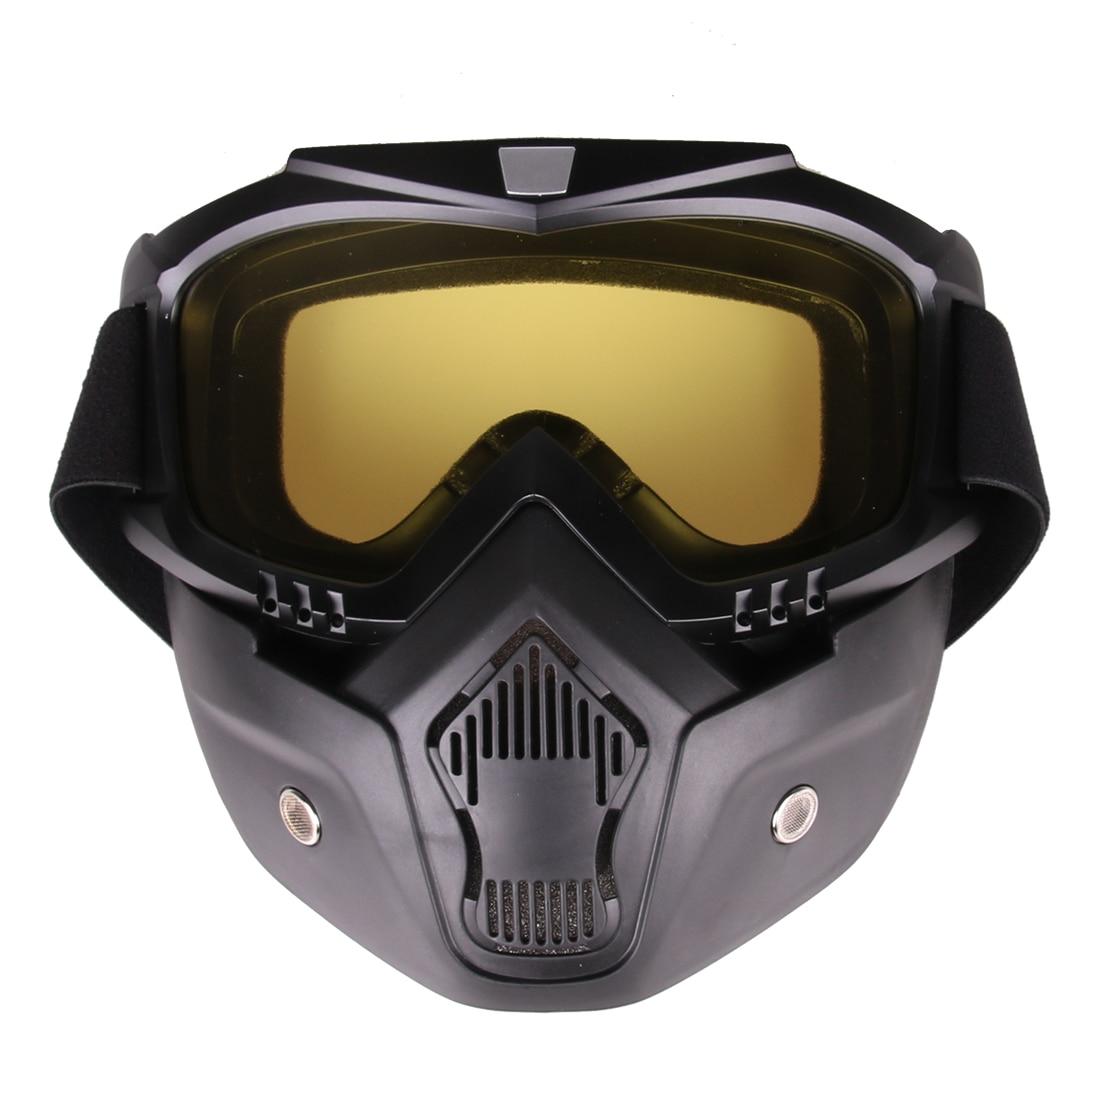 Classic Style Tactical Mask Soft Bullet Dart Beskyttende Spejl Face - Rekreation og sport i open air